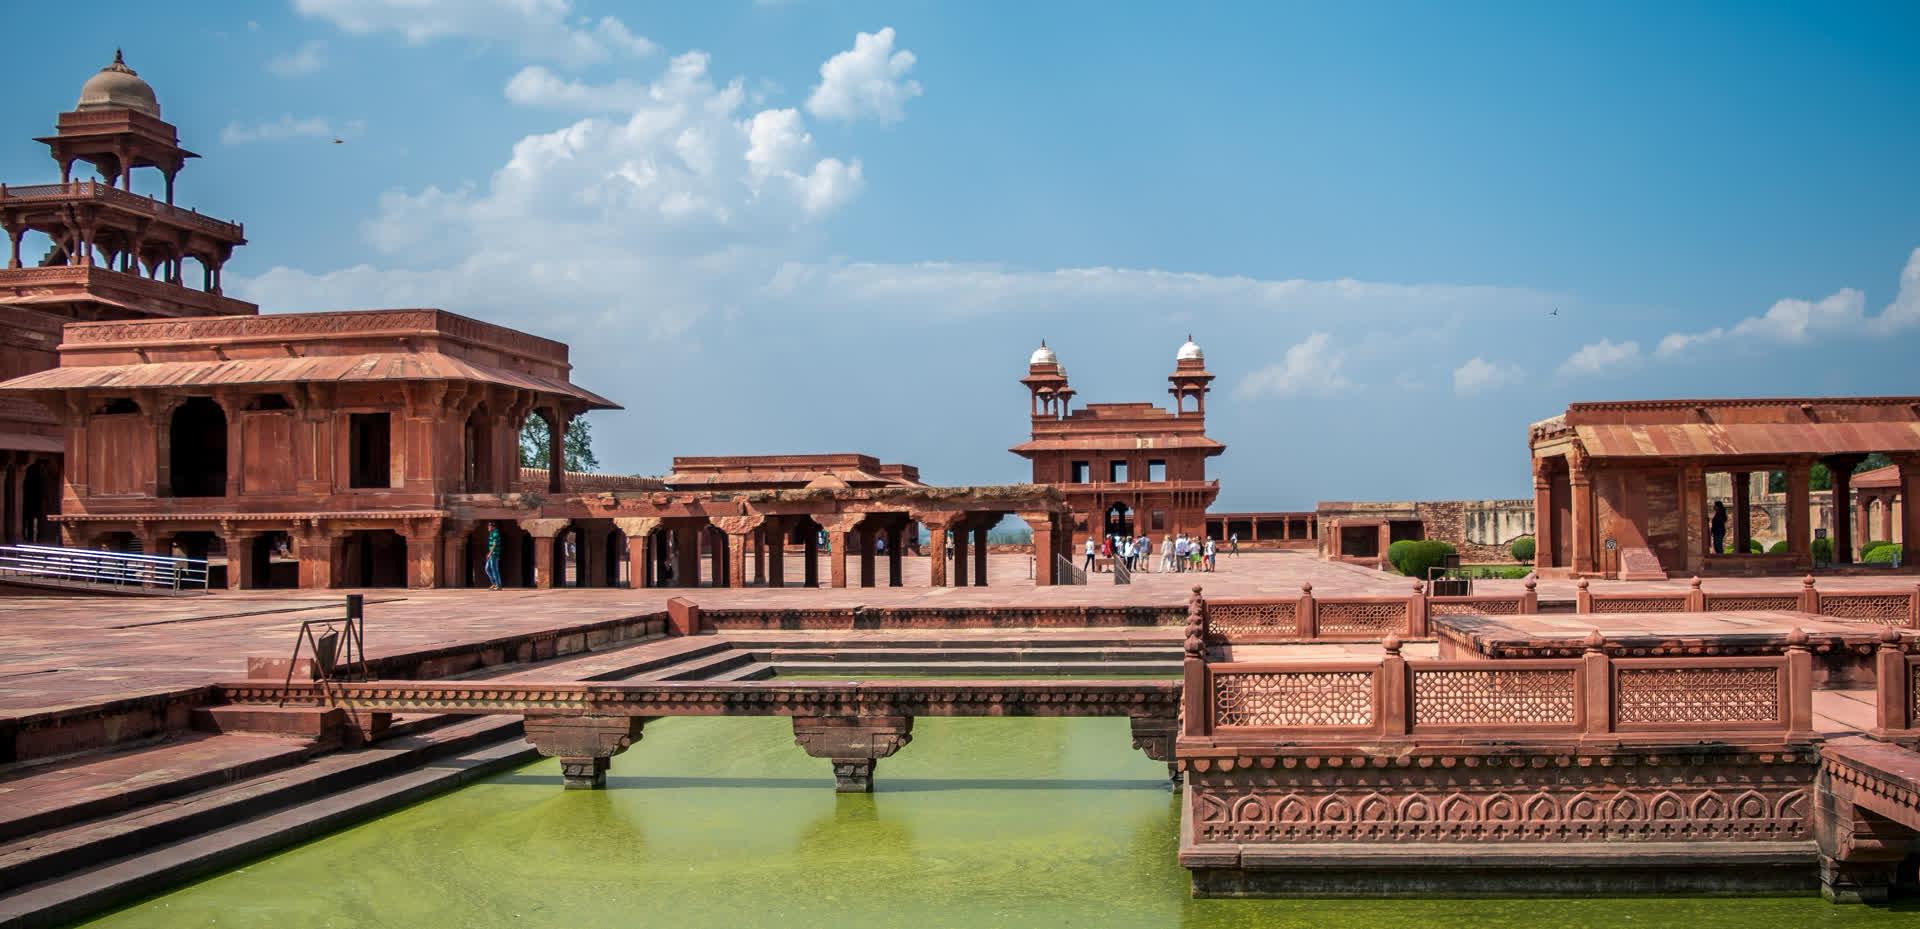 Fatehpur Sikri: Symphony in Red